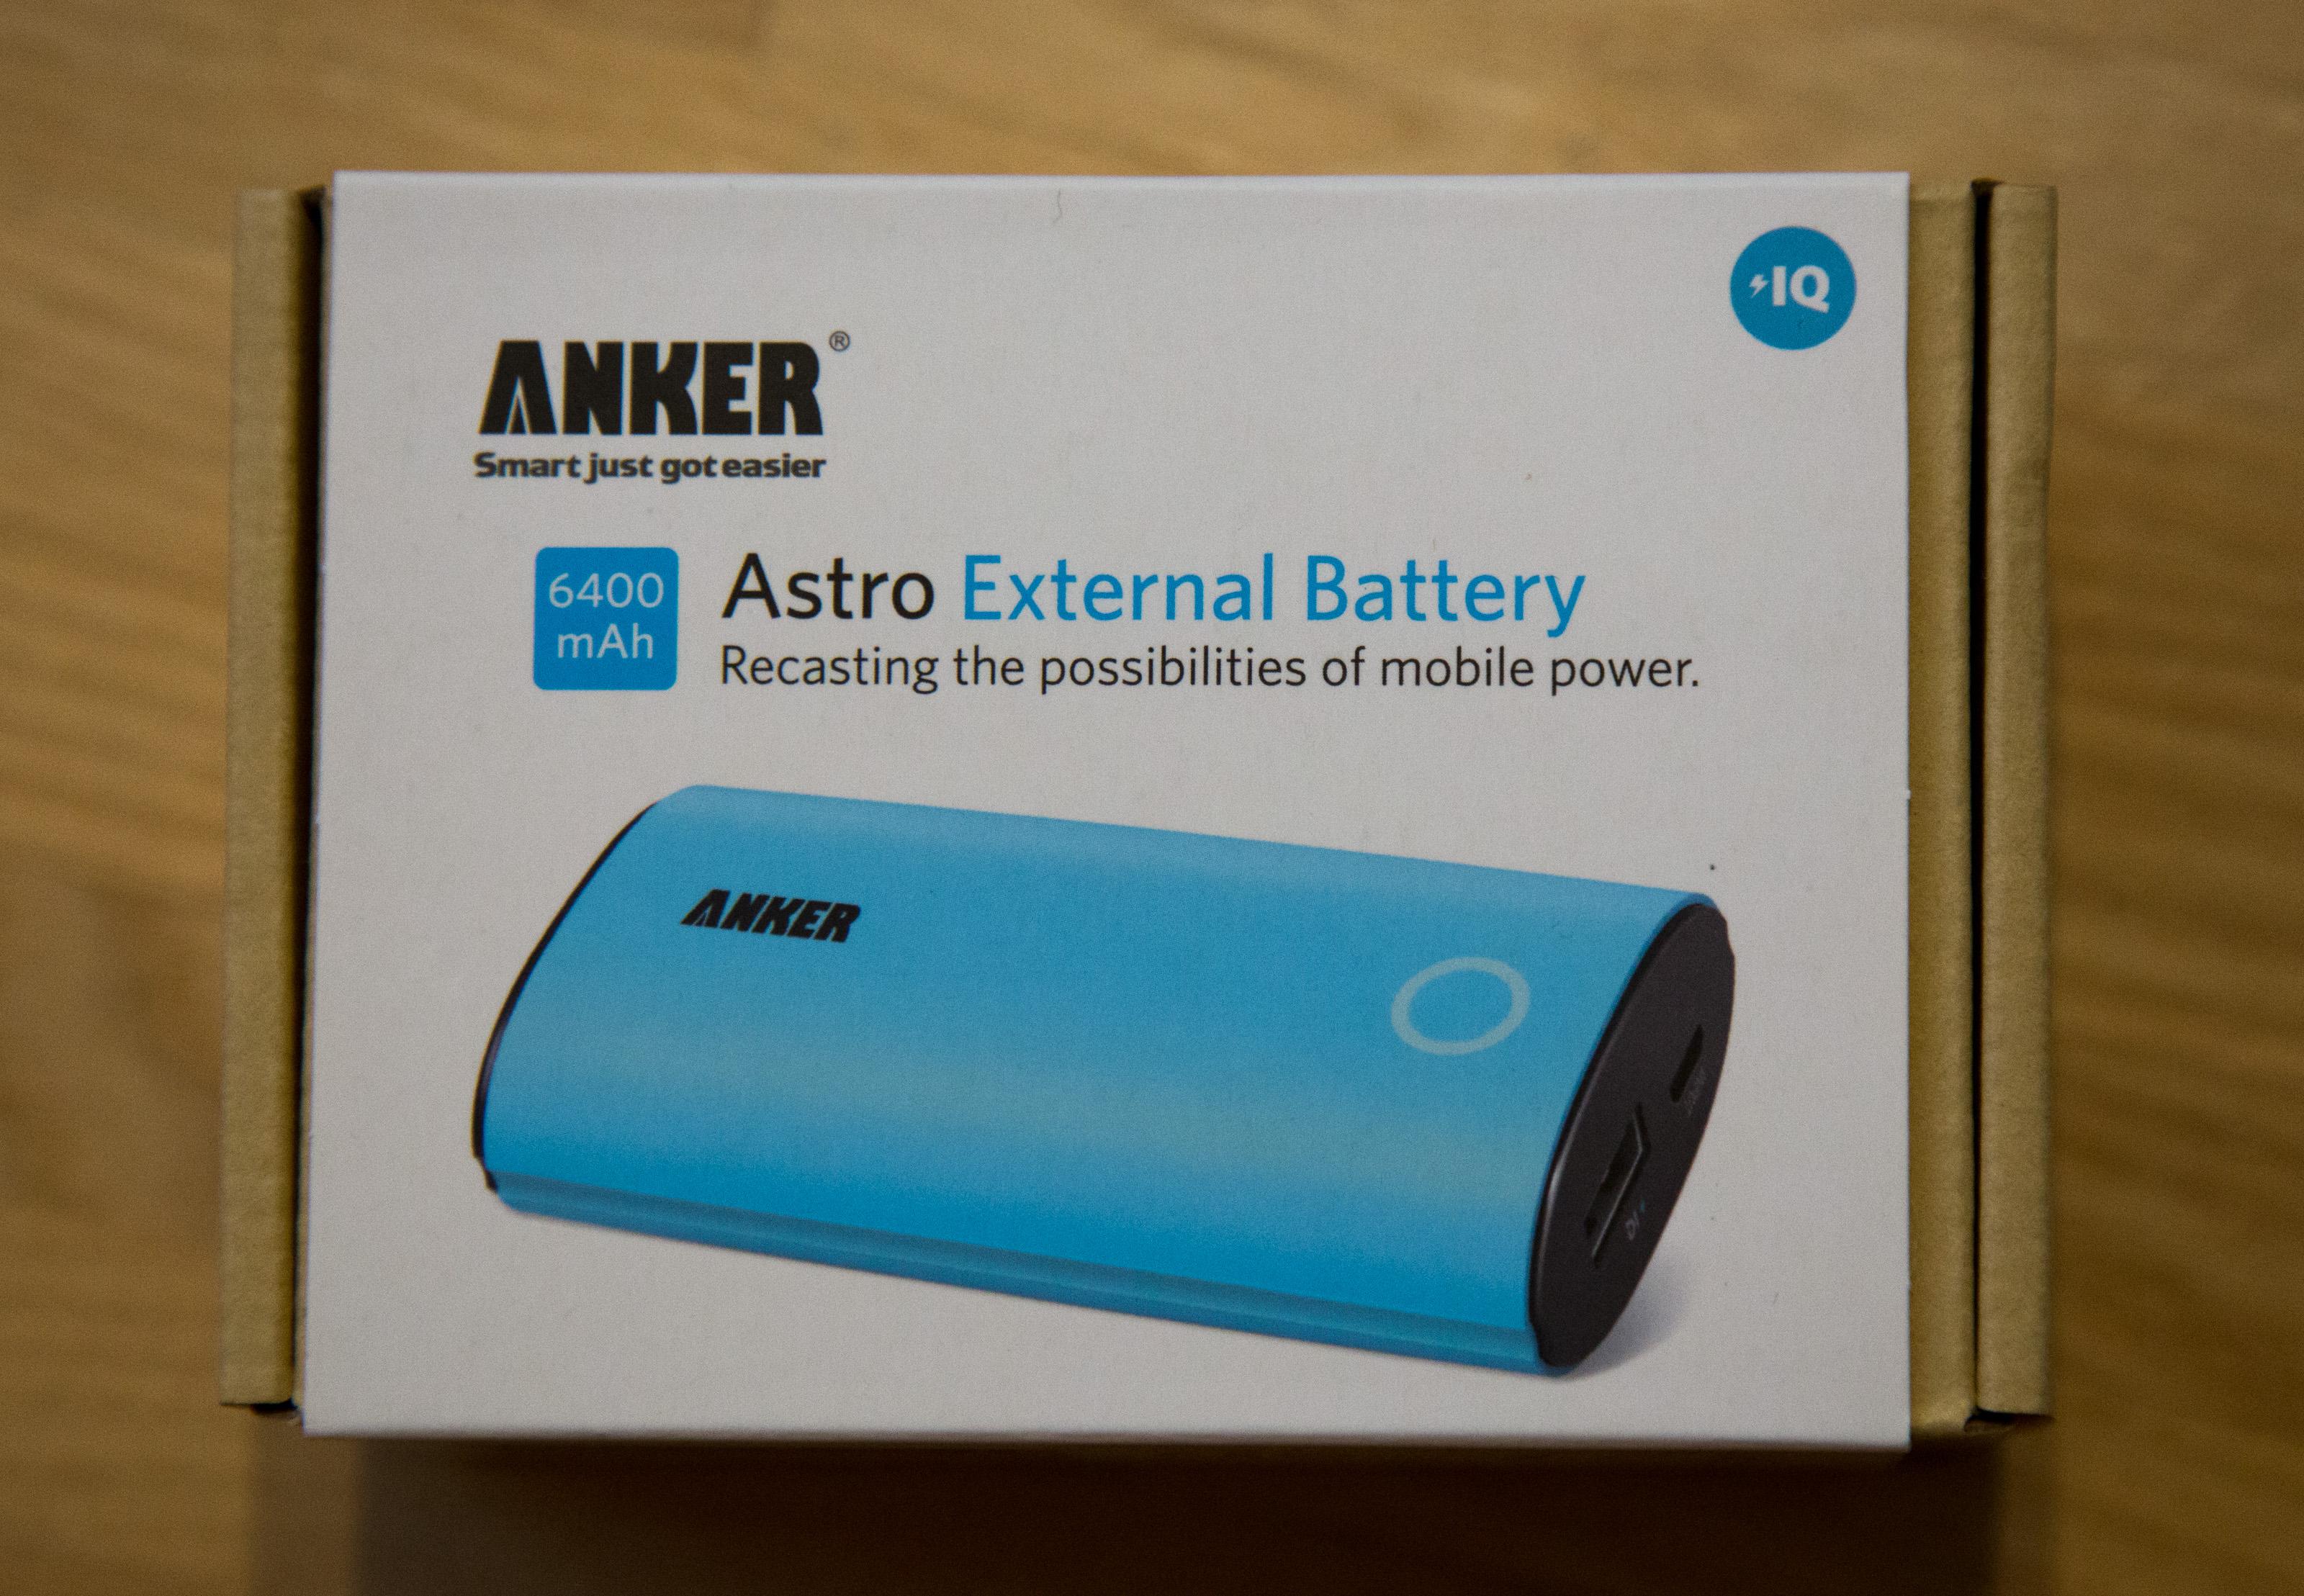 Anker Astro External Battery